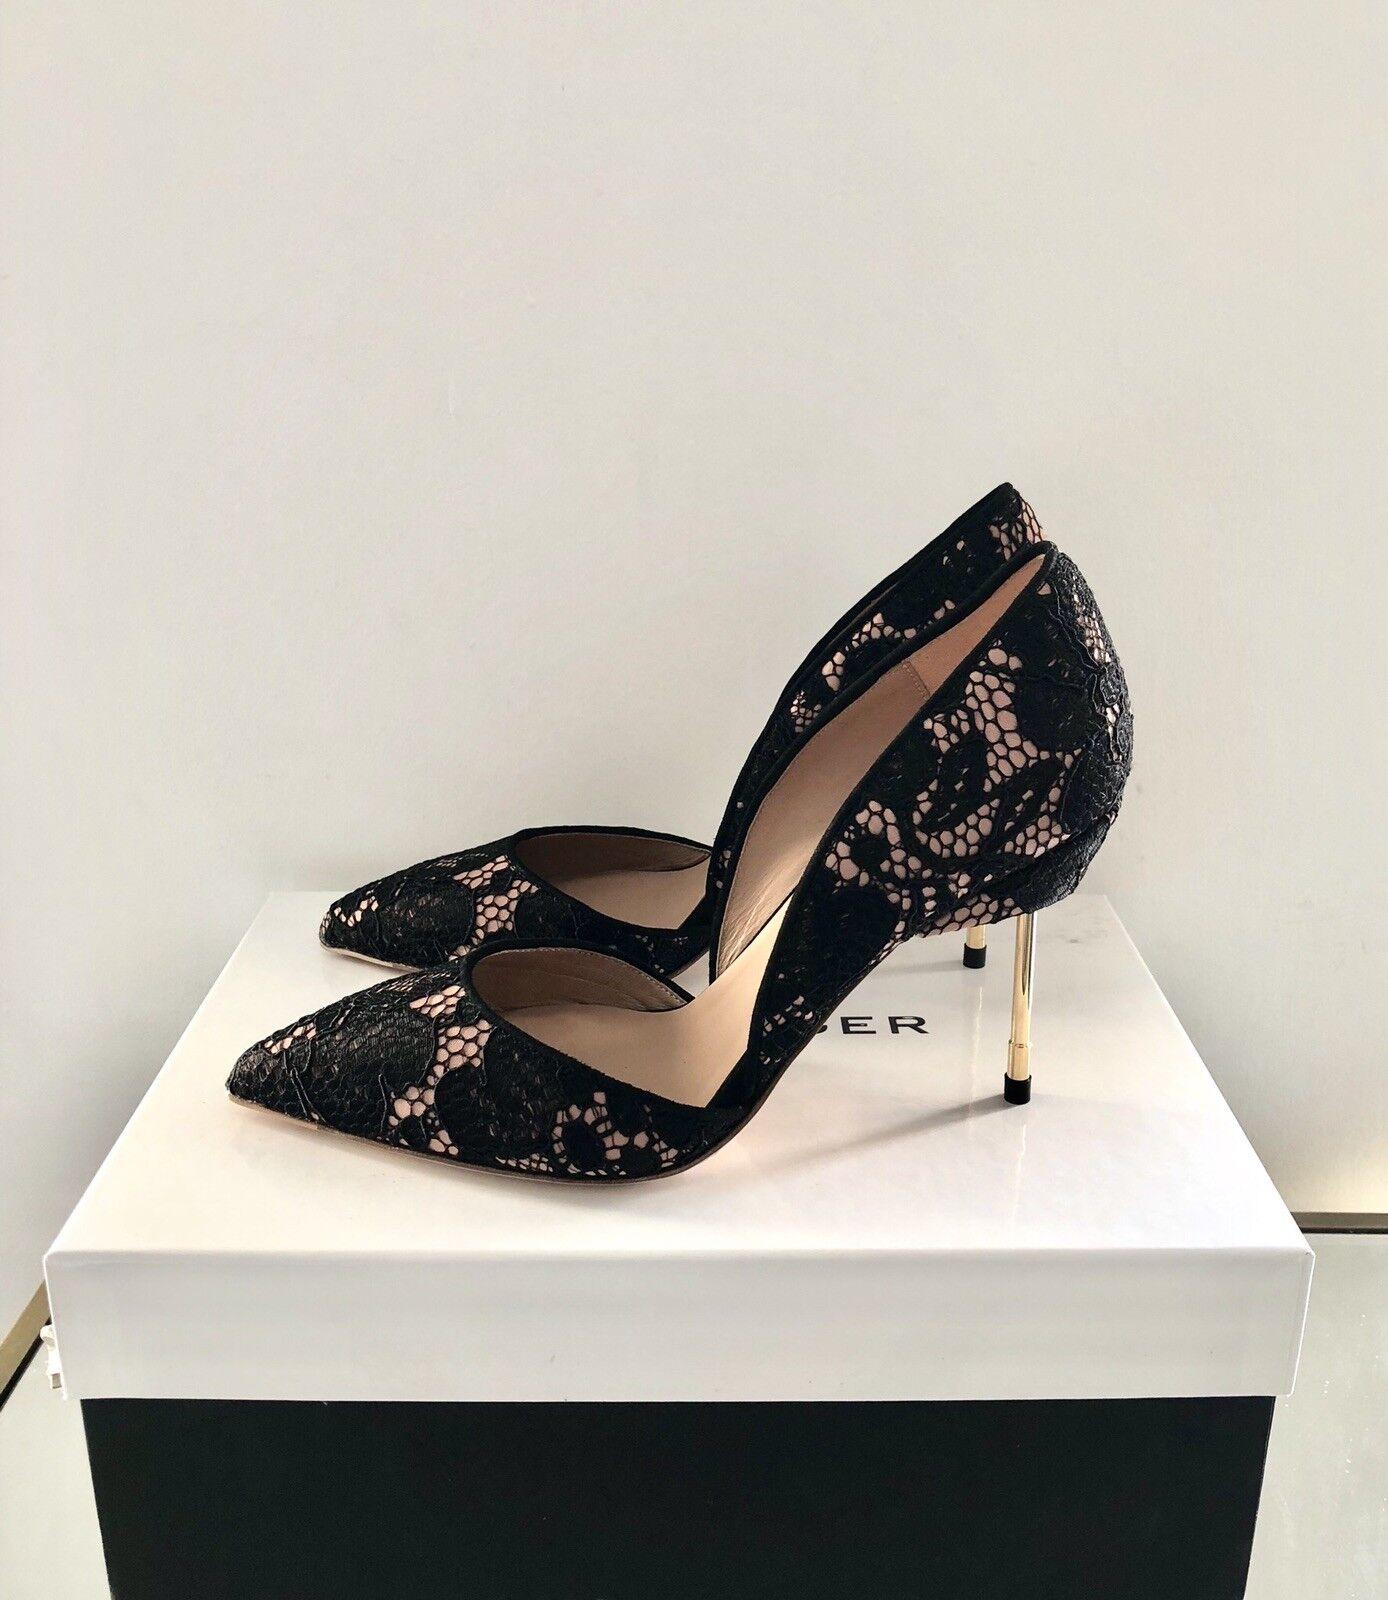 Negro Tacón Alto Alto Alto Tribunal Zapatos Talla 7 40 Kurt Geiger London Beaumont Bond  Nuevo  entrega rápida